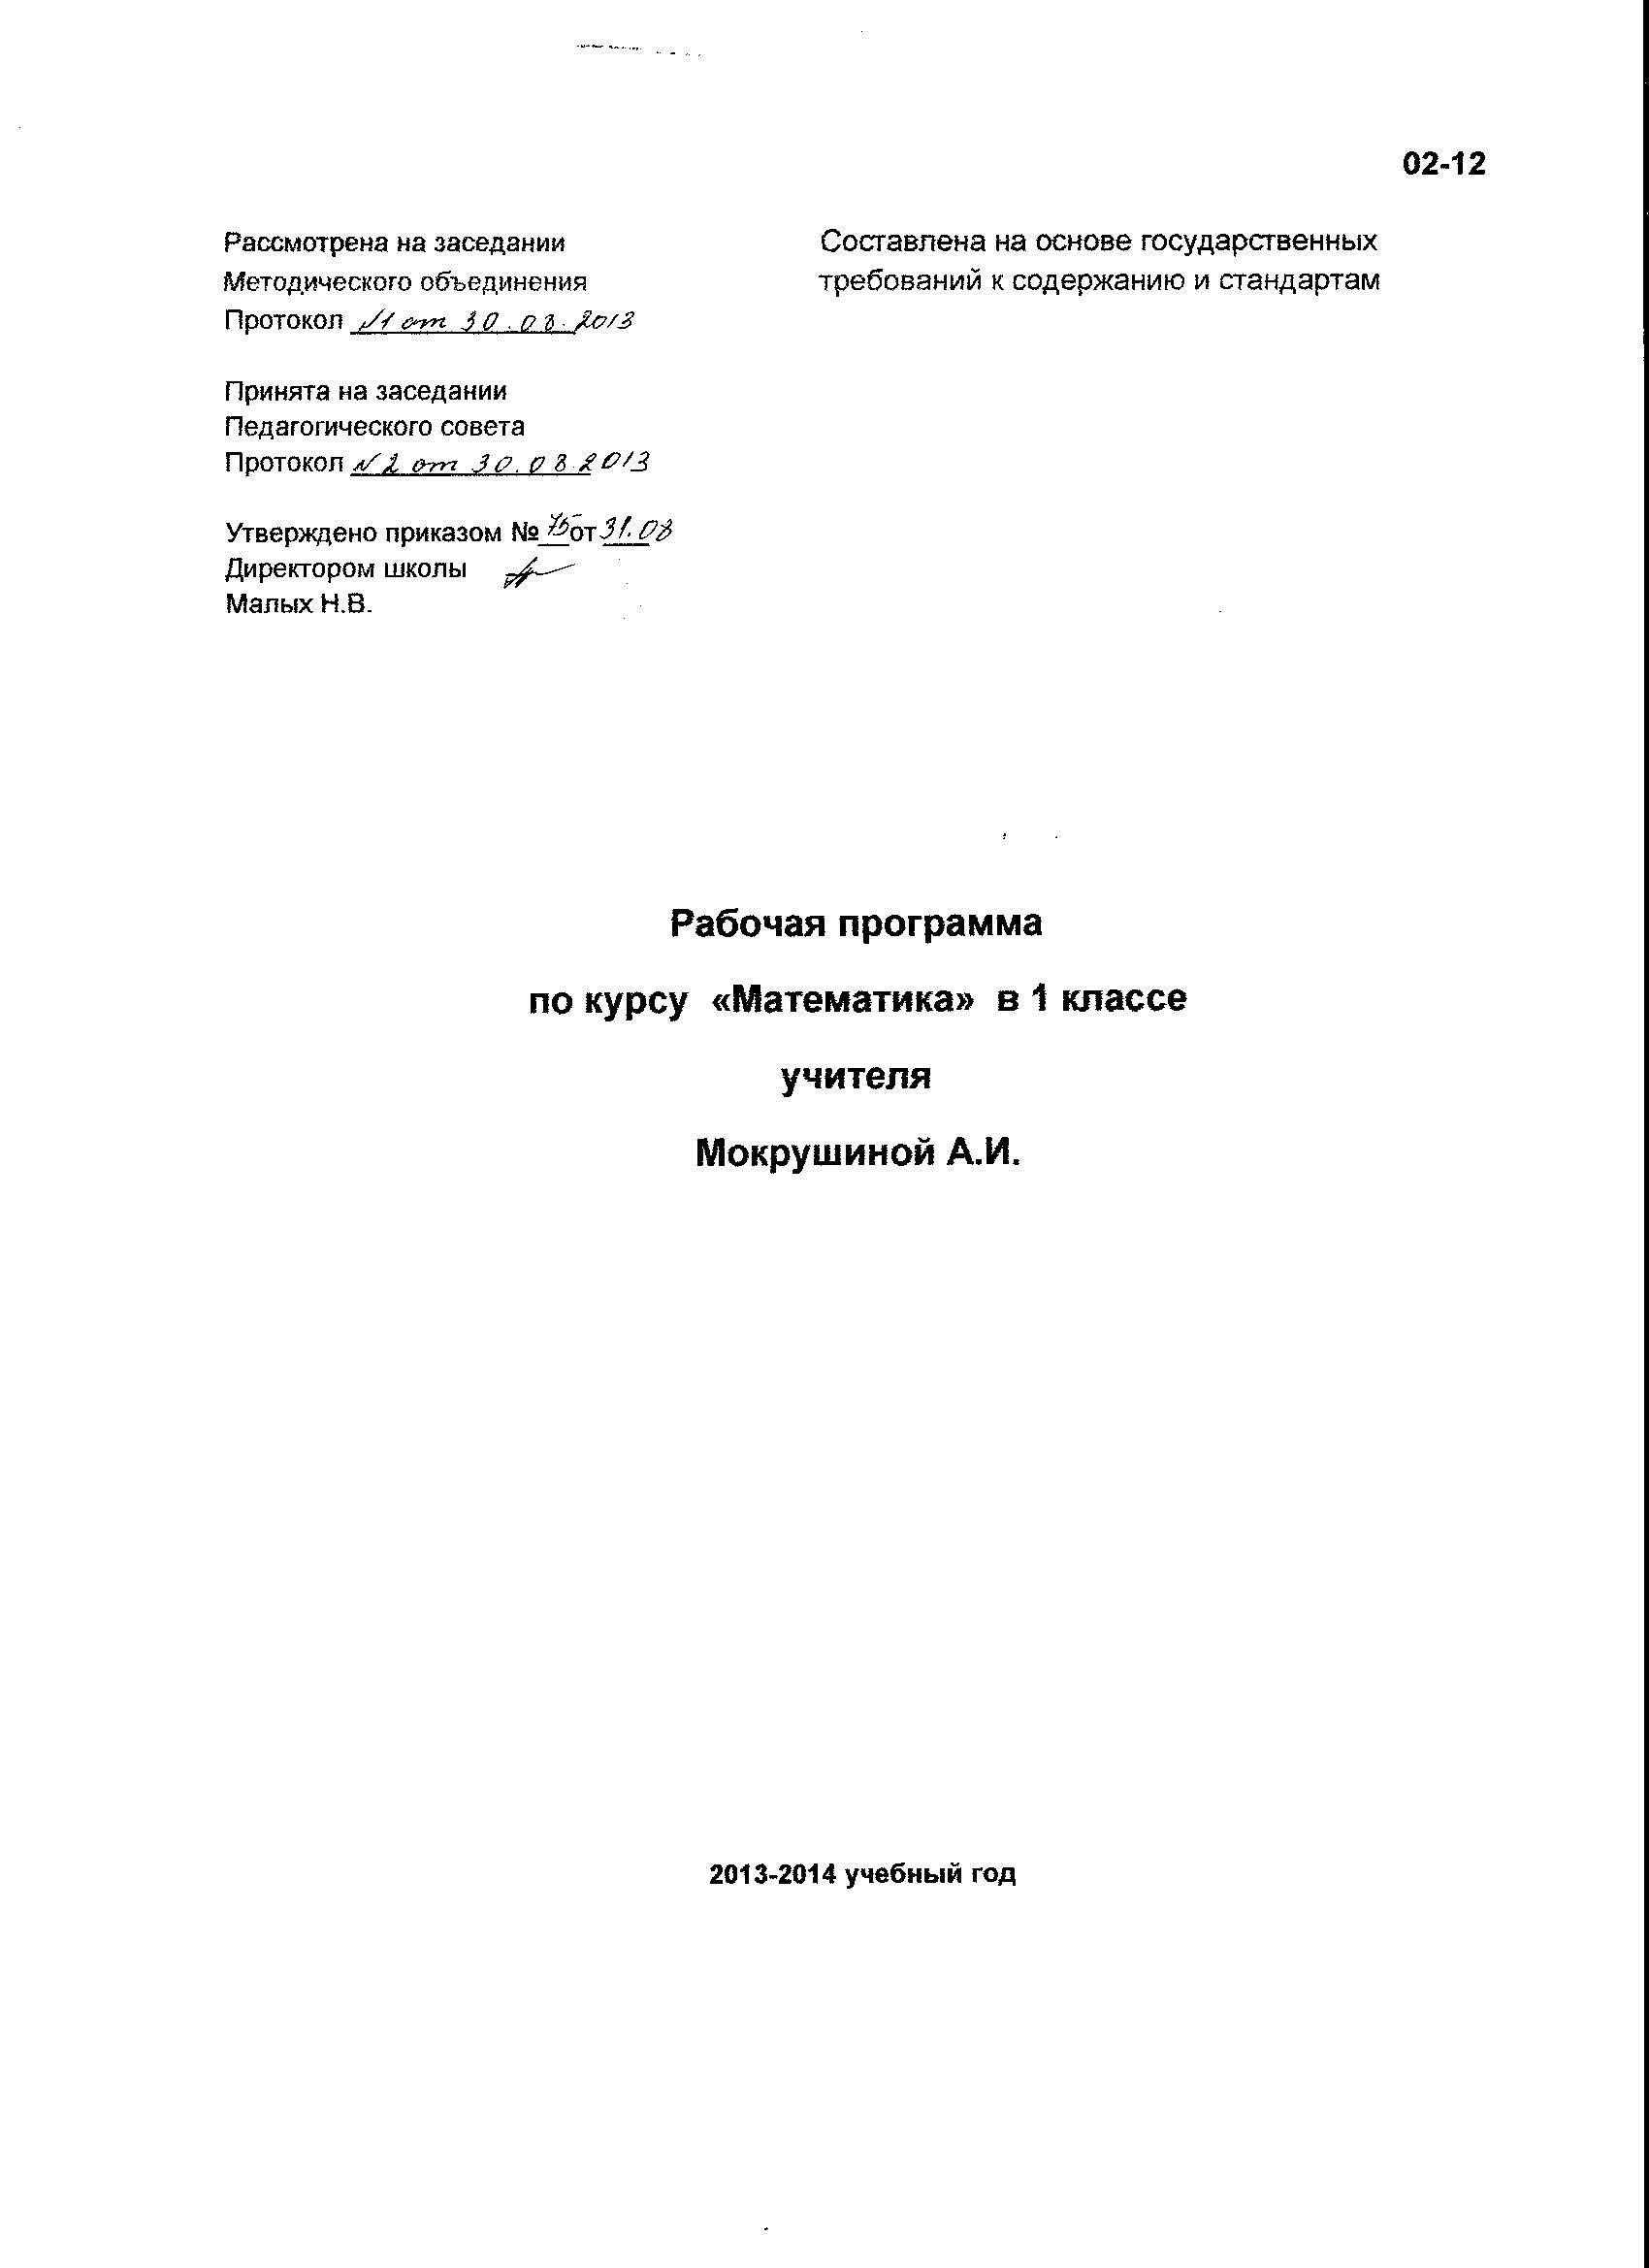 C:\Documents and Settings\маша\Мои документы\Мои рисунки\контра\контра 066.jpg